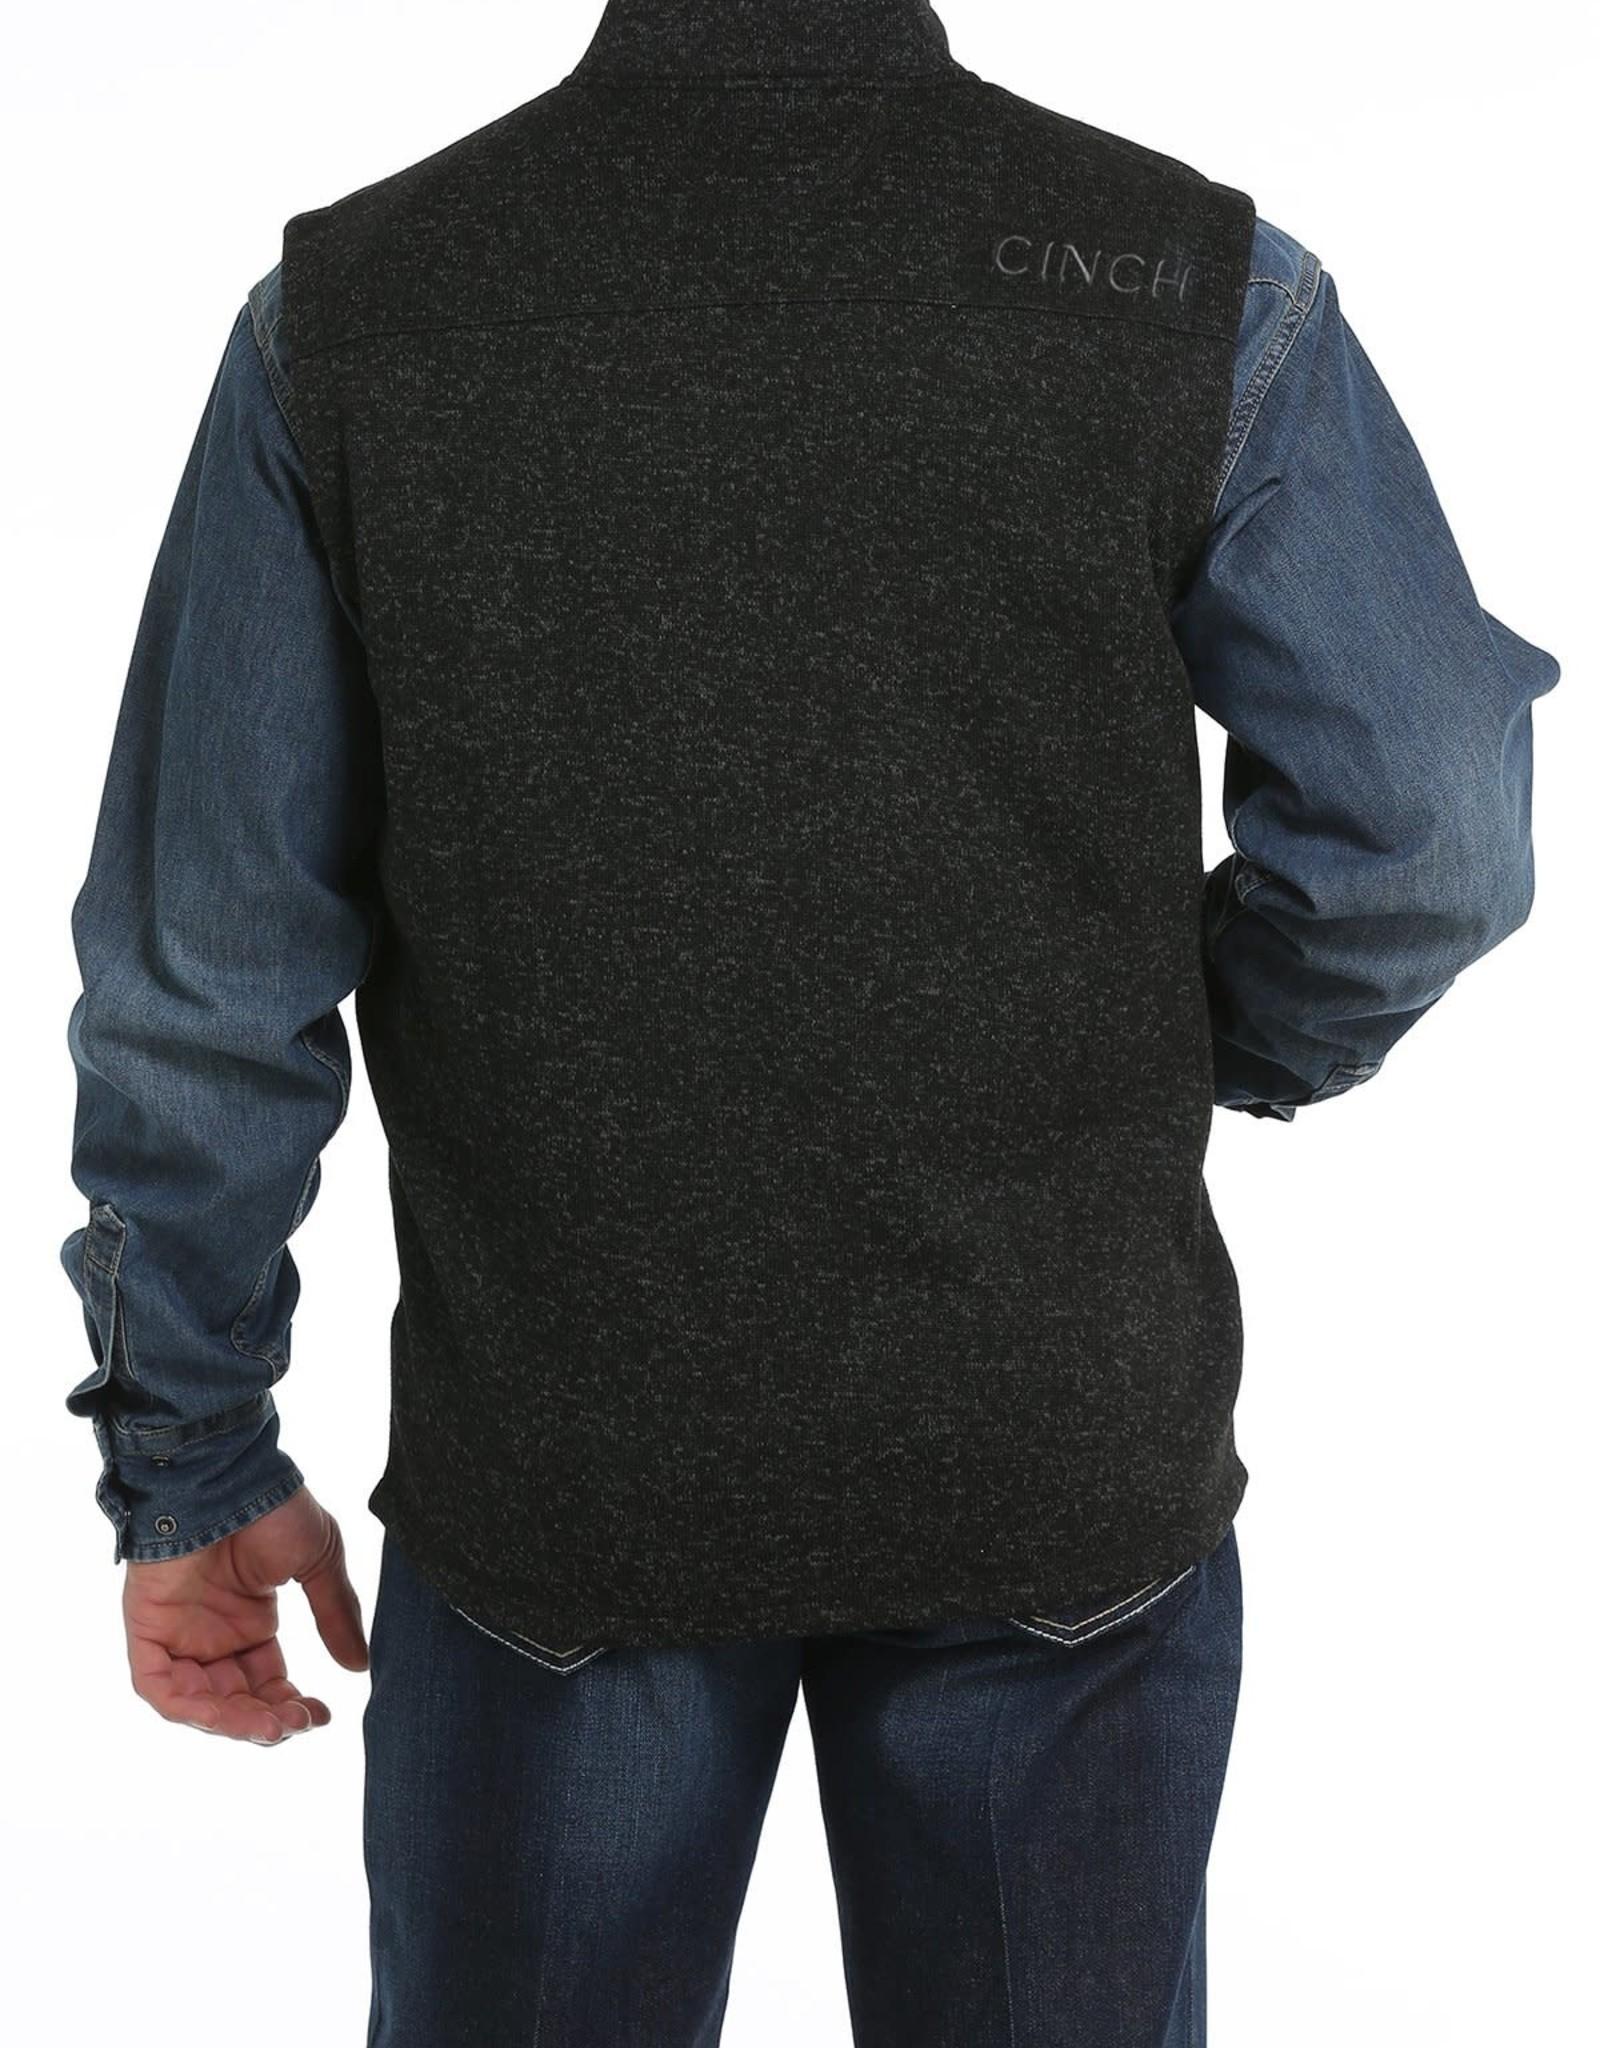 Cinch Cinch Mens Sweater Knit Fleece Vest Heather Black